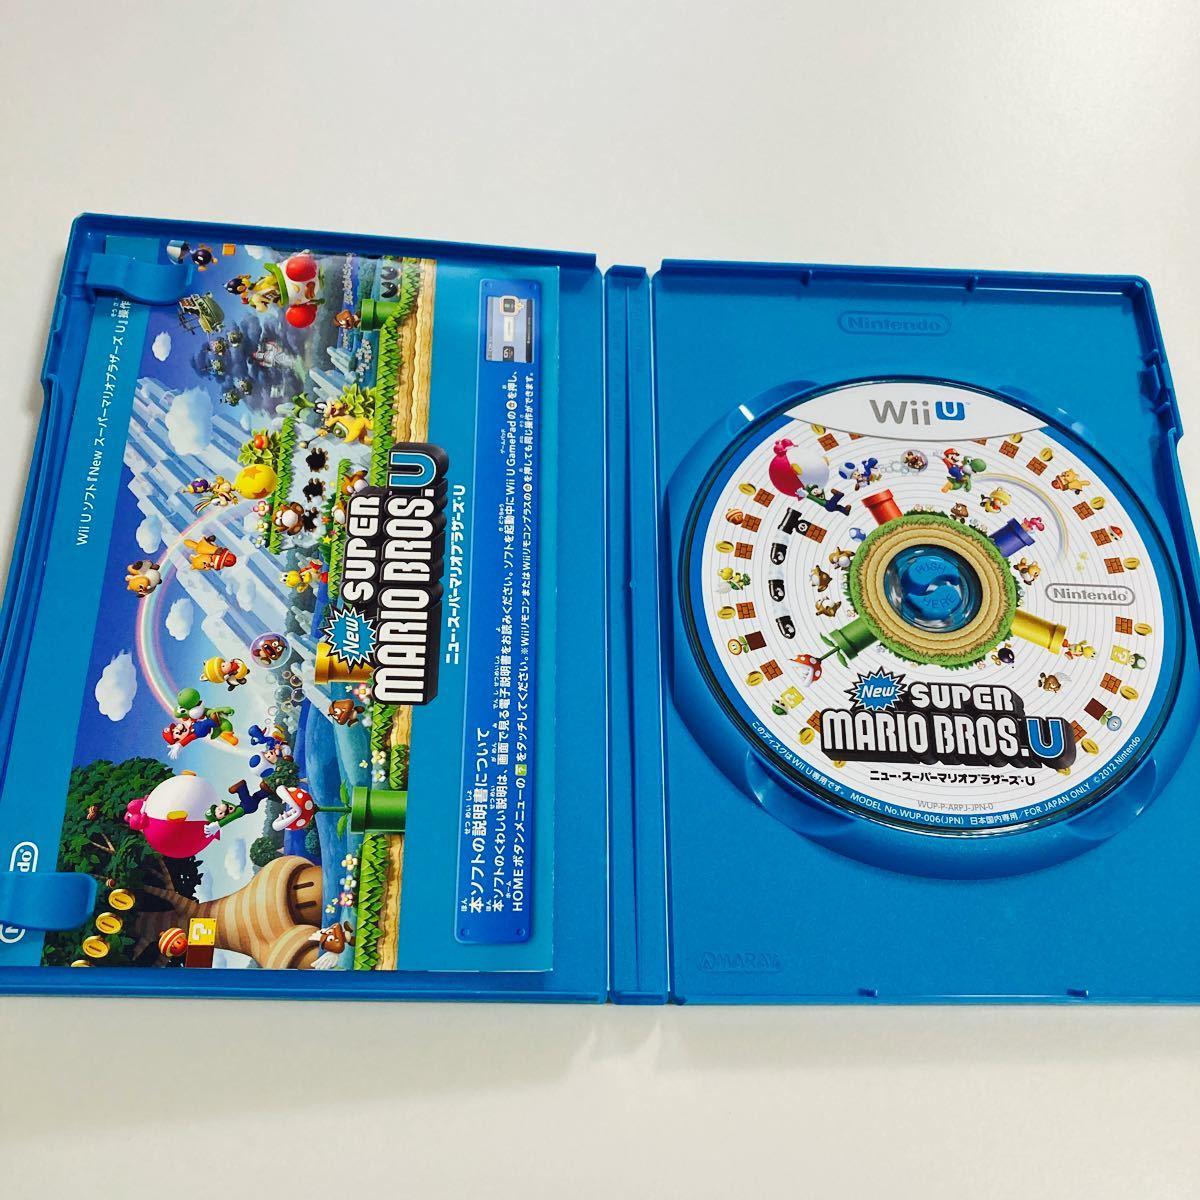 WiiU NewスーパーマリオブラザーズU ソフト SUPER MARIO BROS.